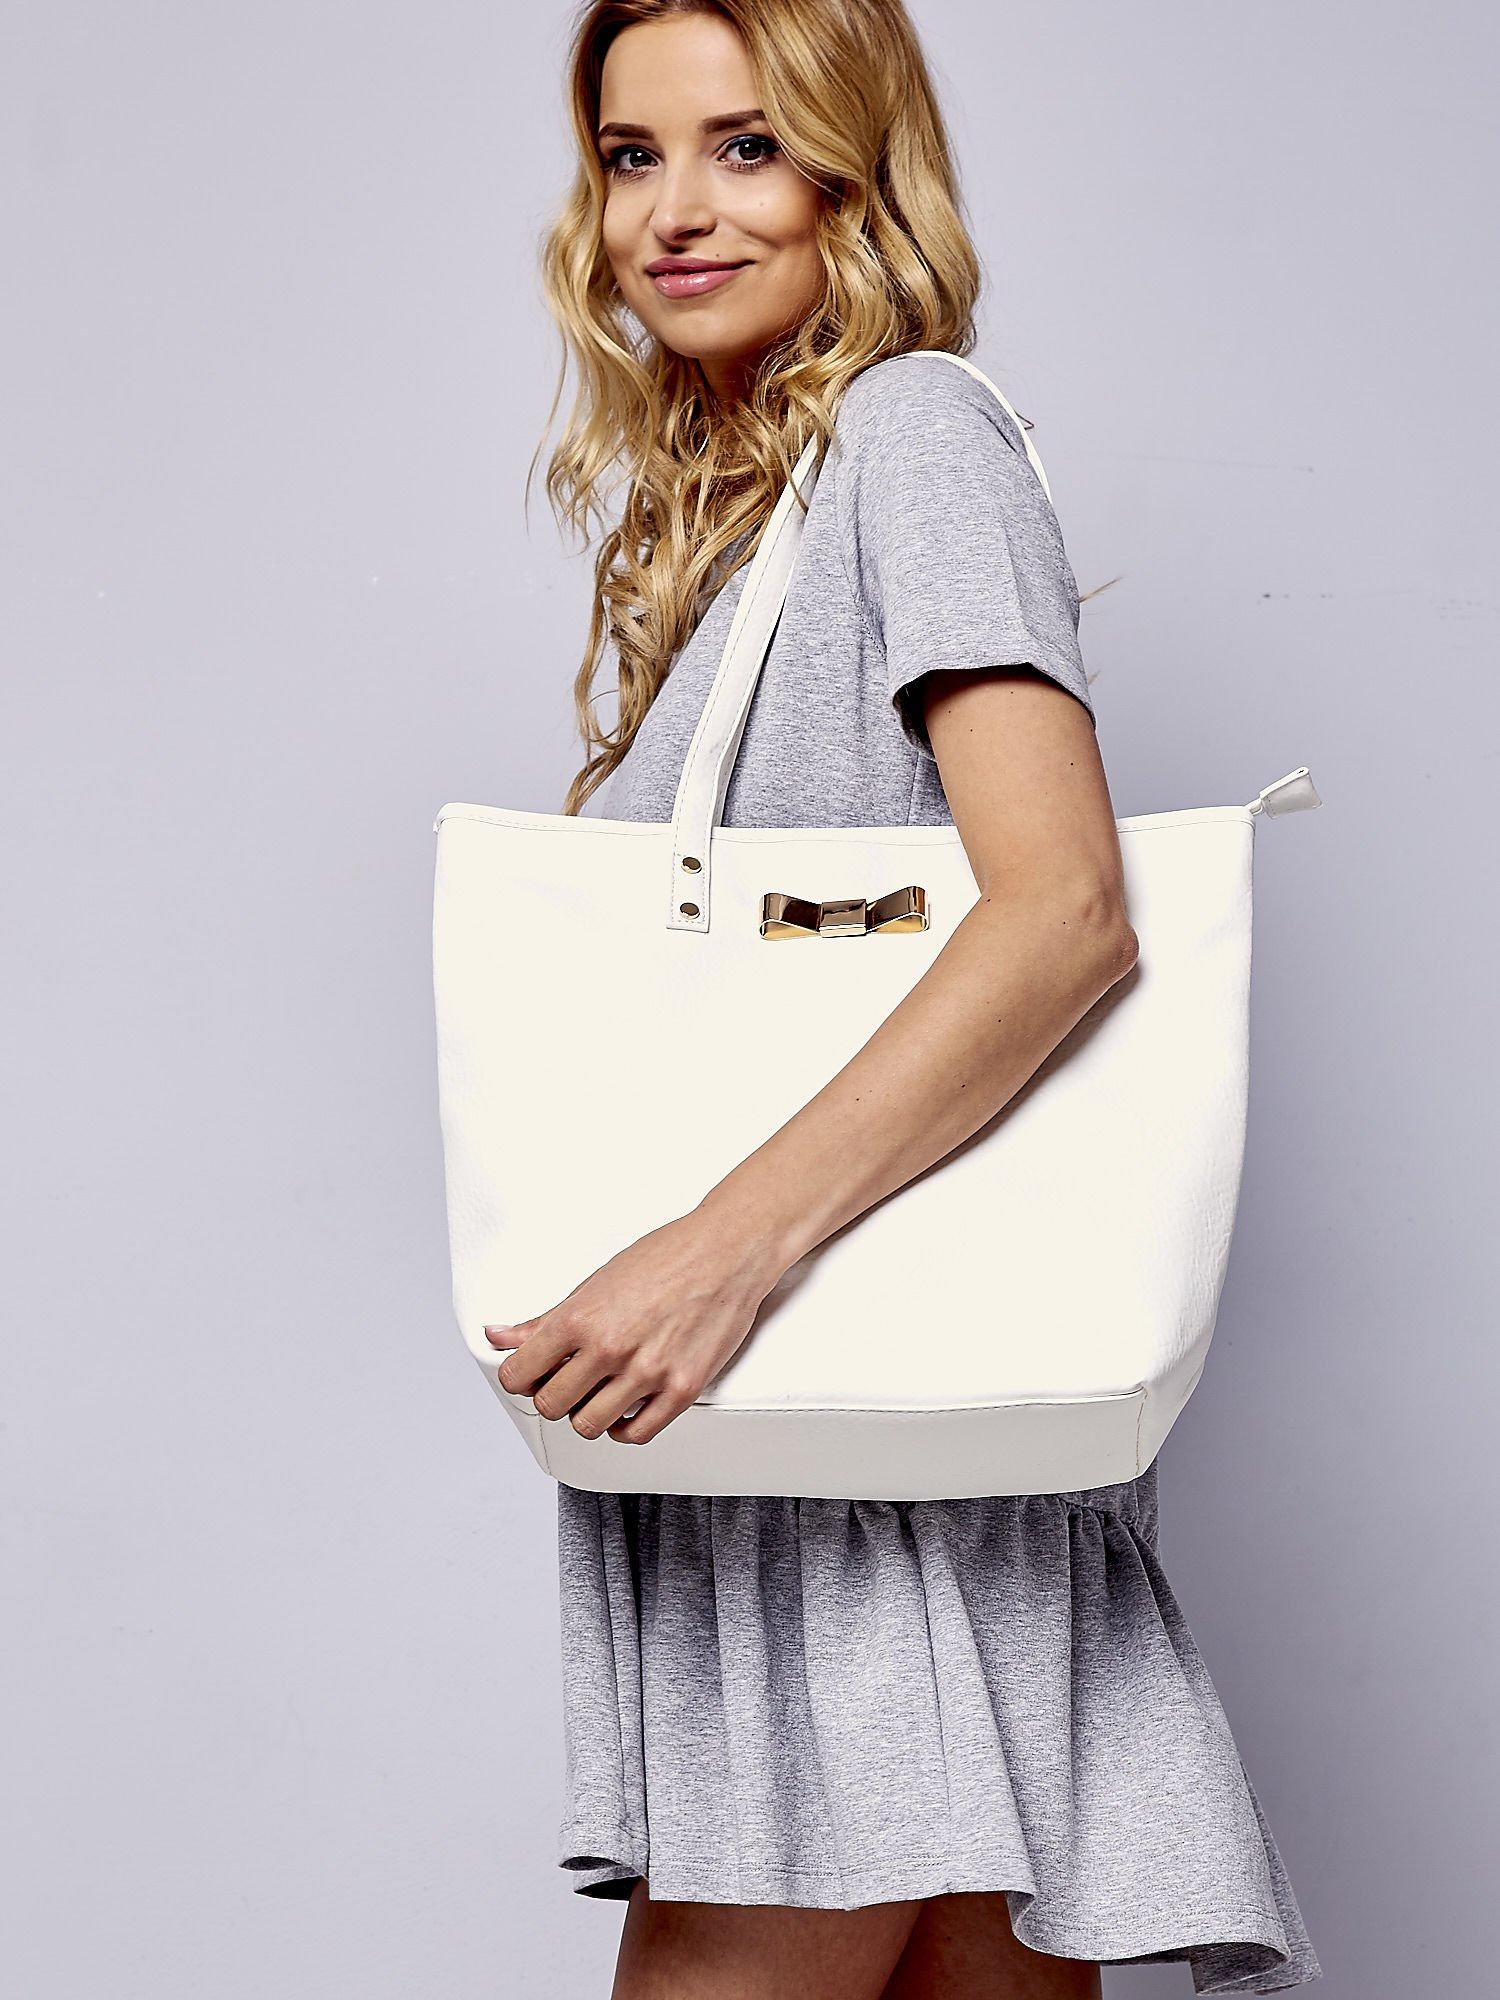 Biała torebka shopper bag z kokardką                                  zdj.                                  2